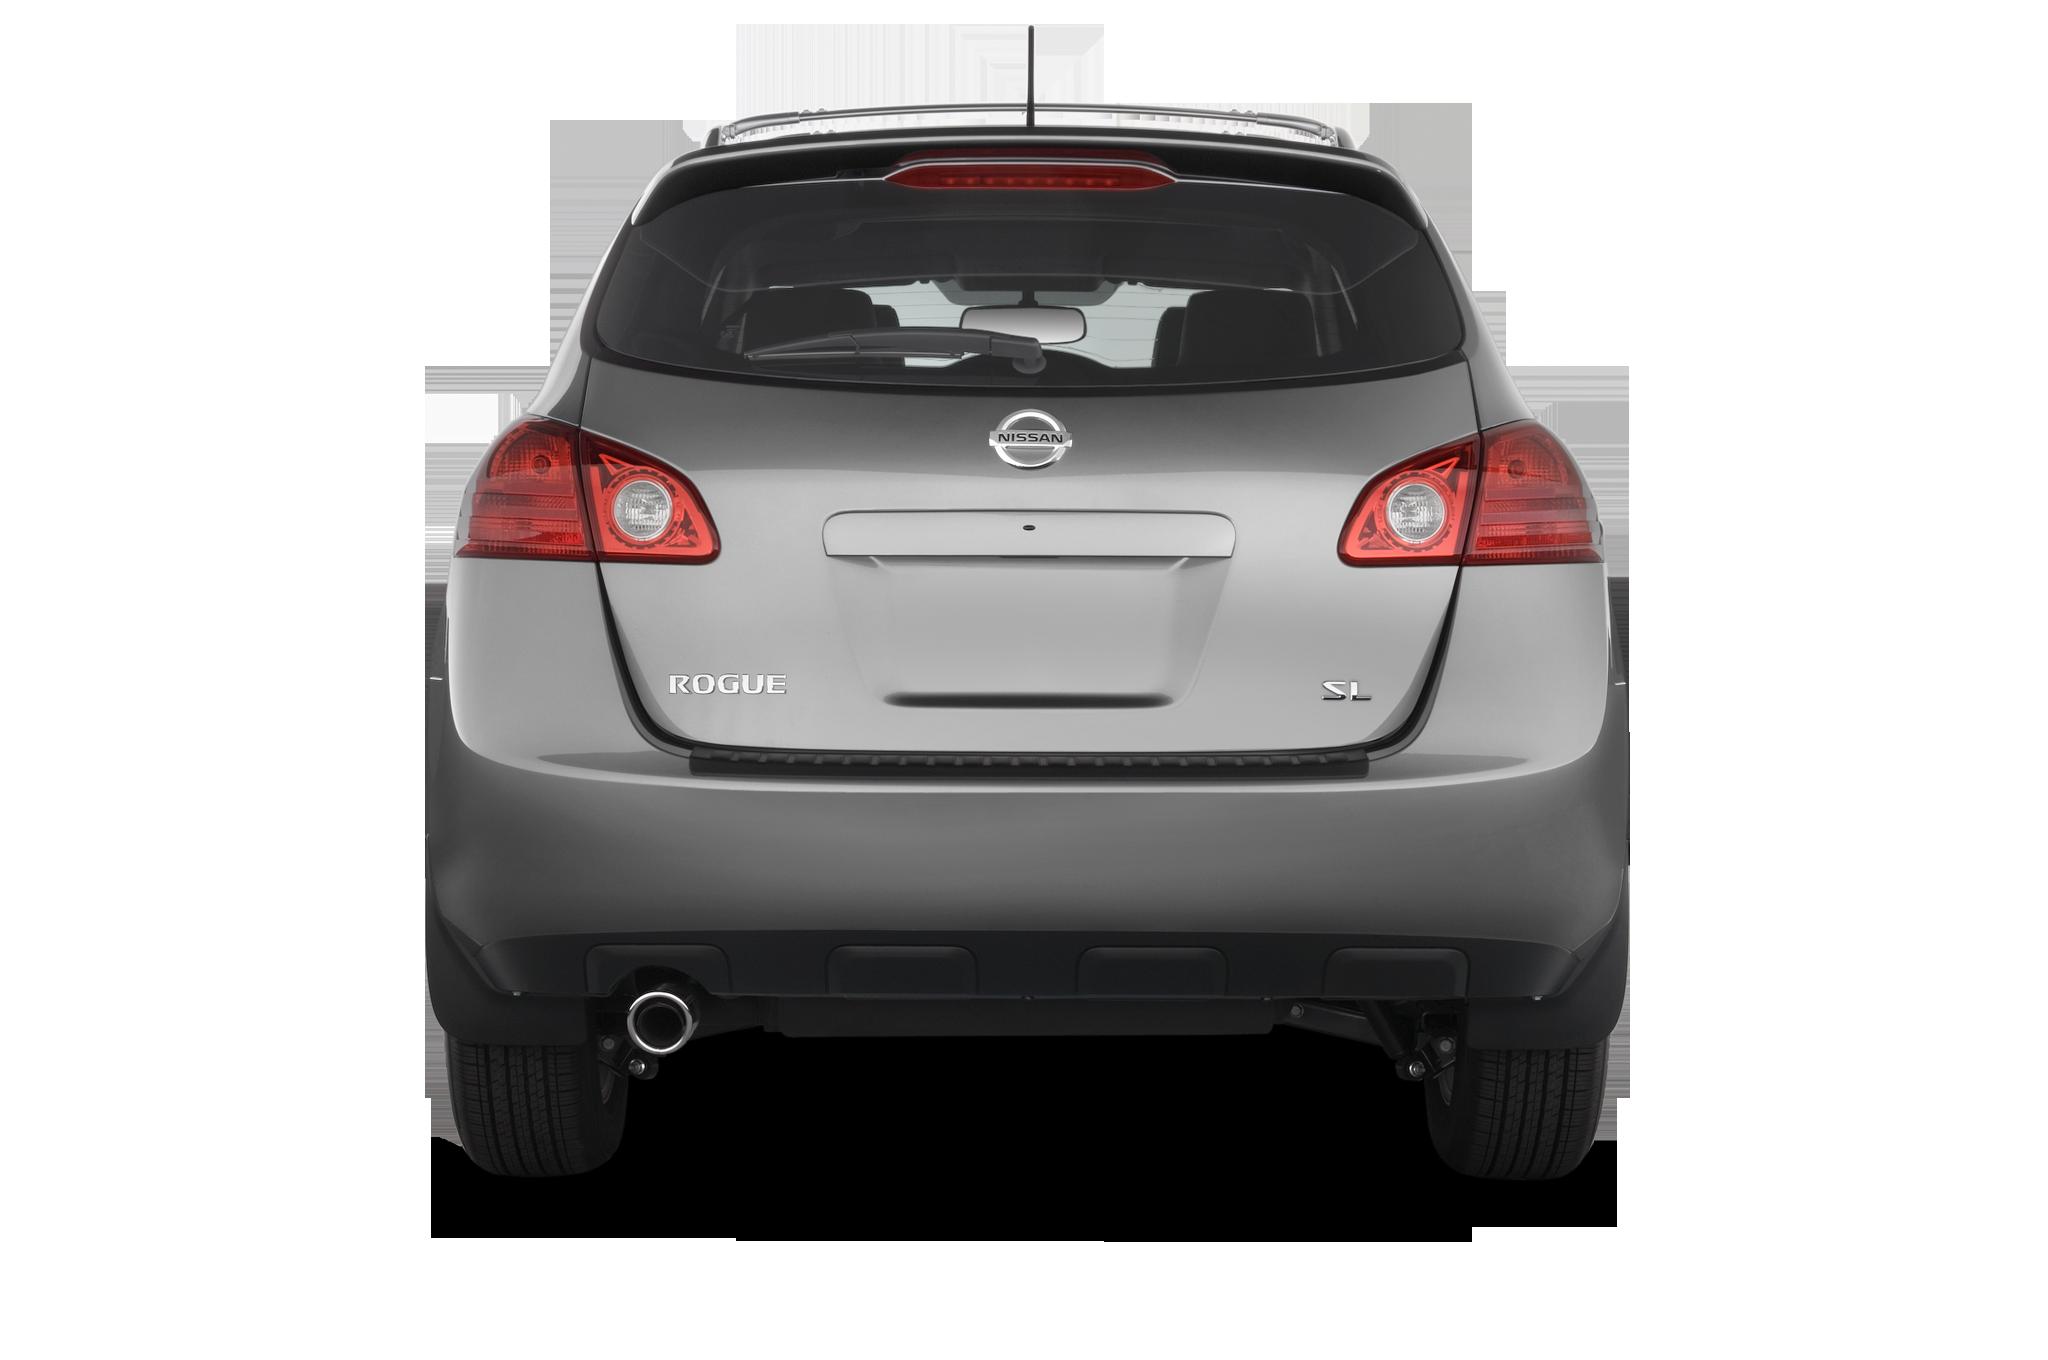 Nissan Rogue I 2007 - 2010 SUV 5 door #3